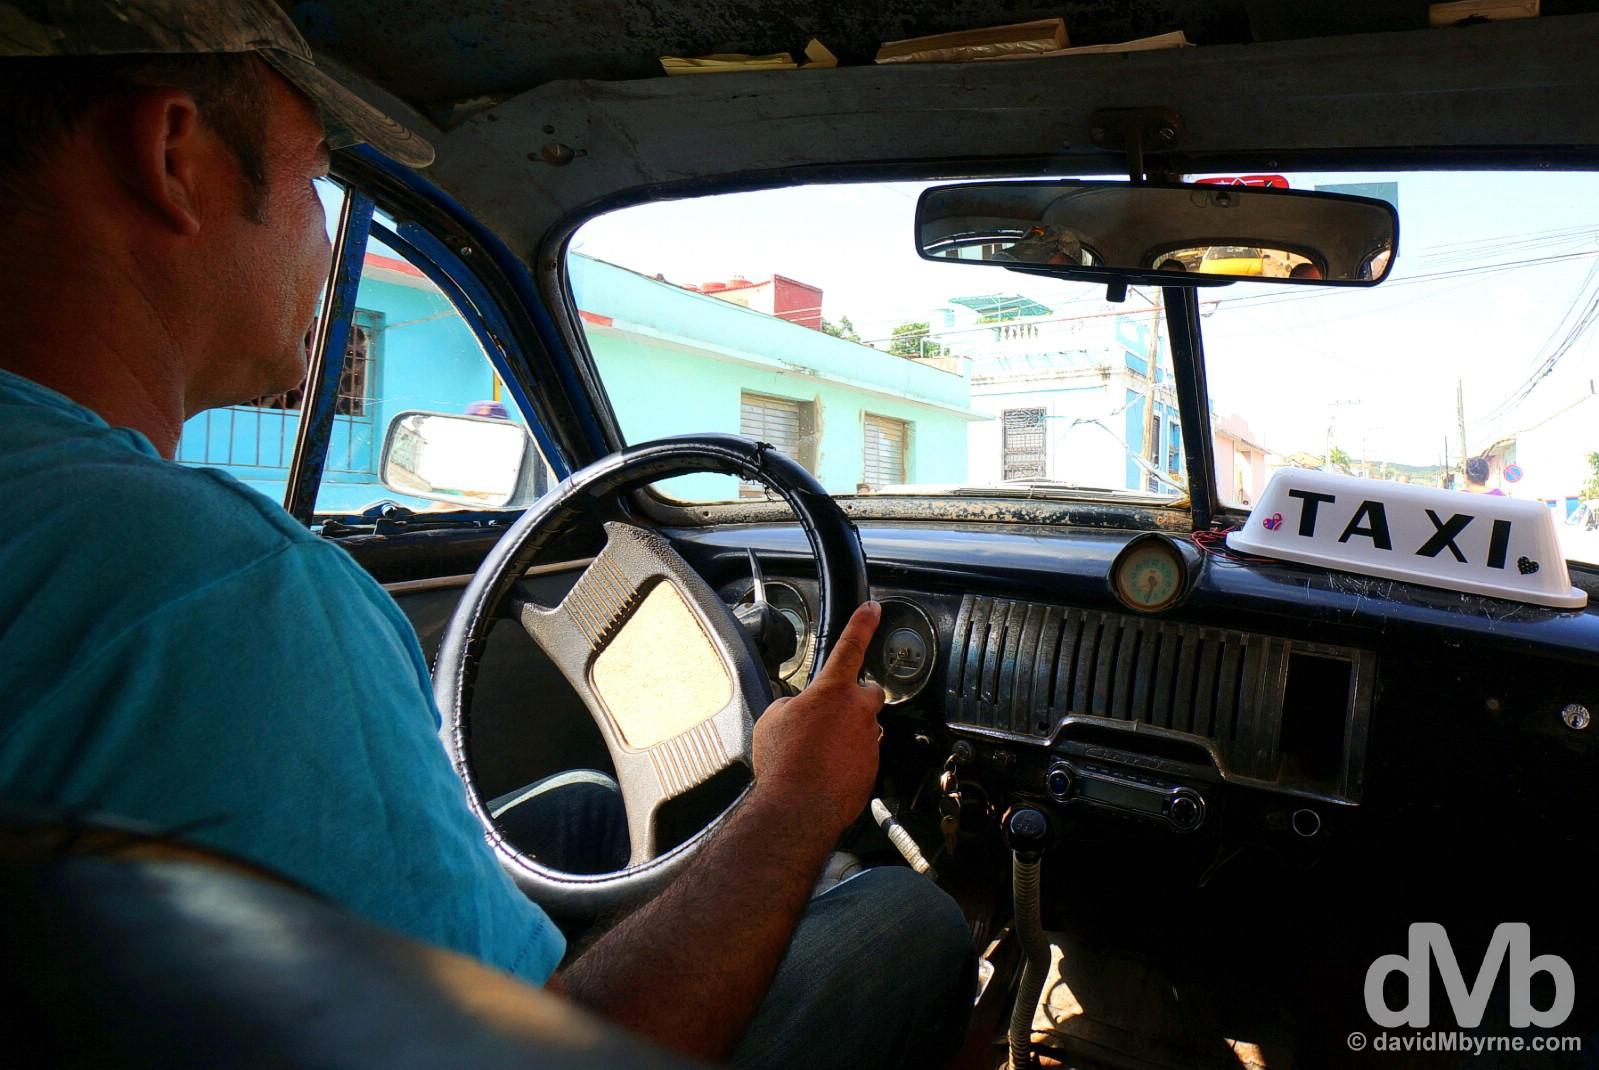 Taxi. Trinidad, Cuba. May 6, 2015.